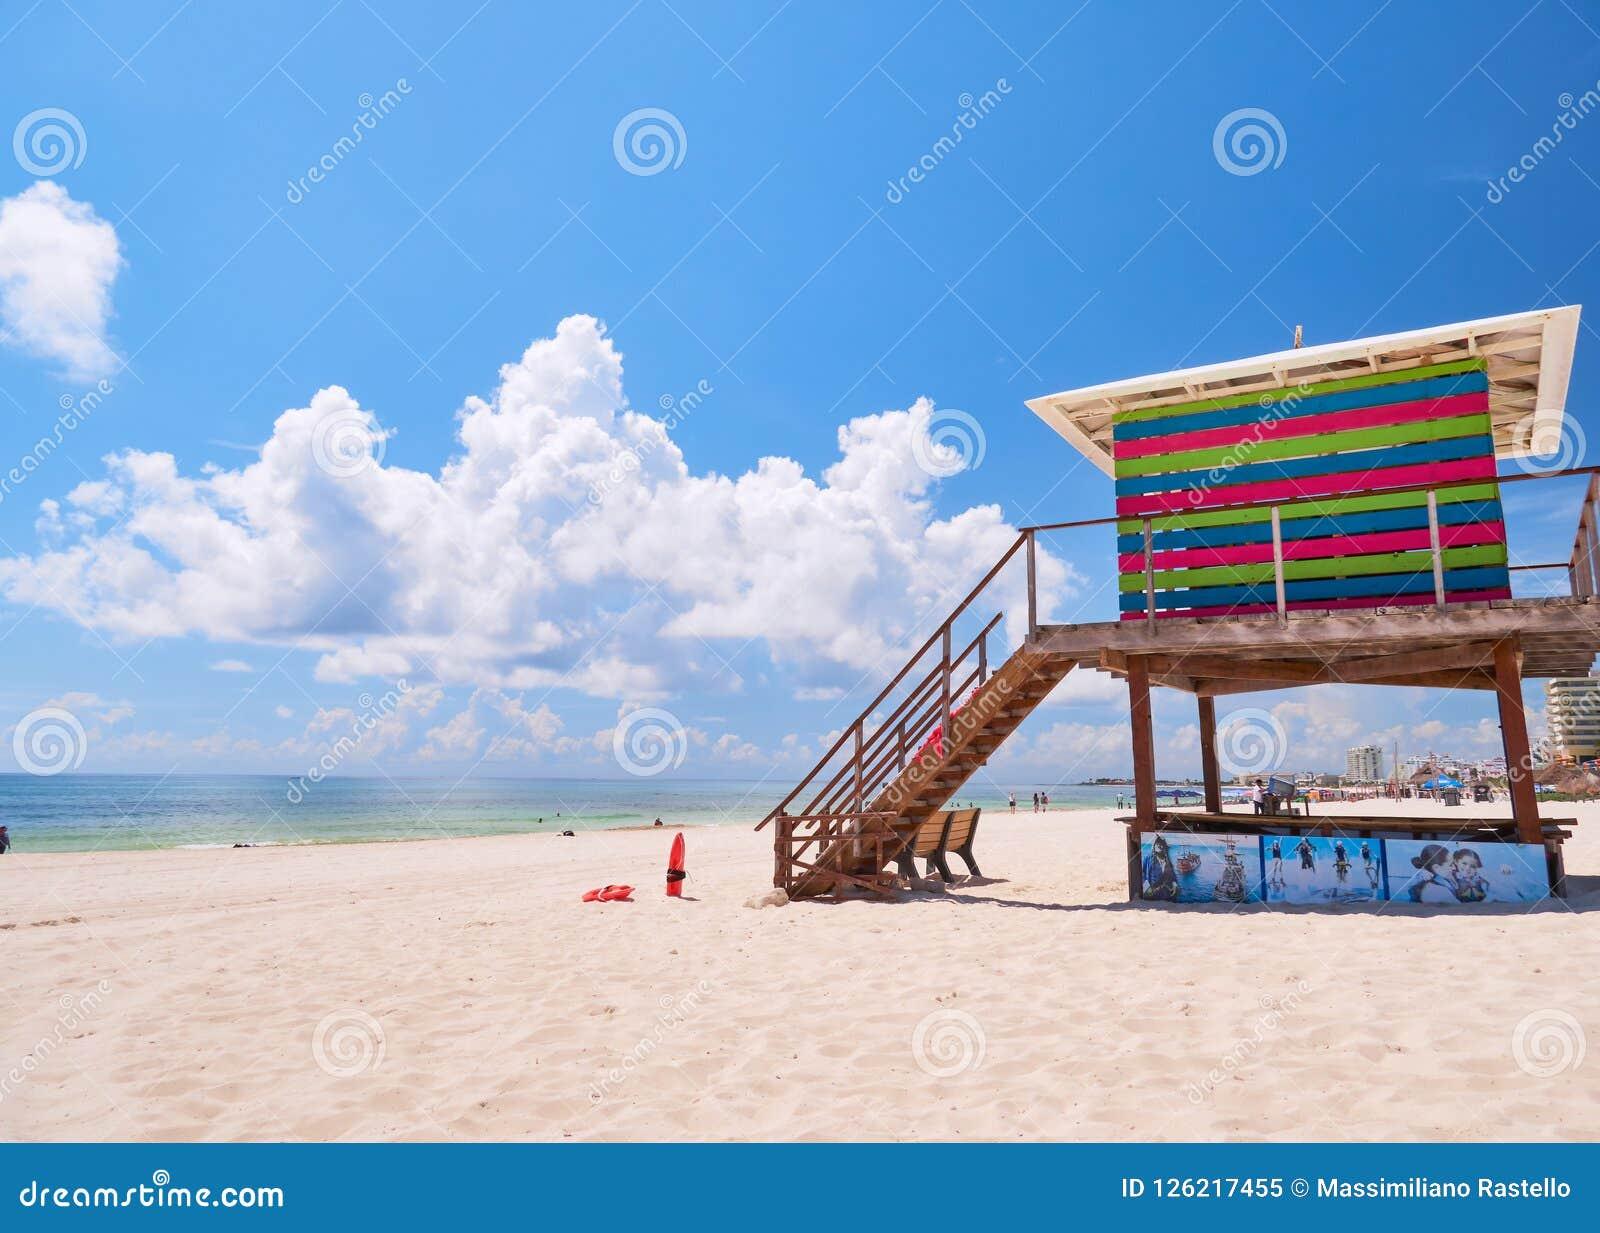 Lifeguard House of Caribbean beach